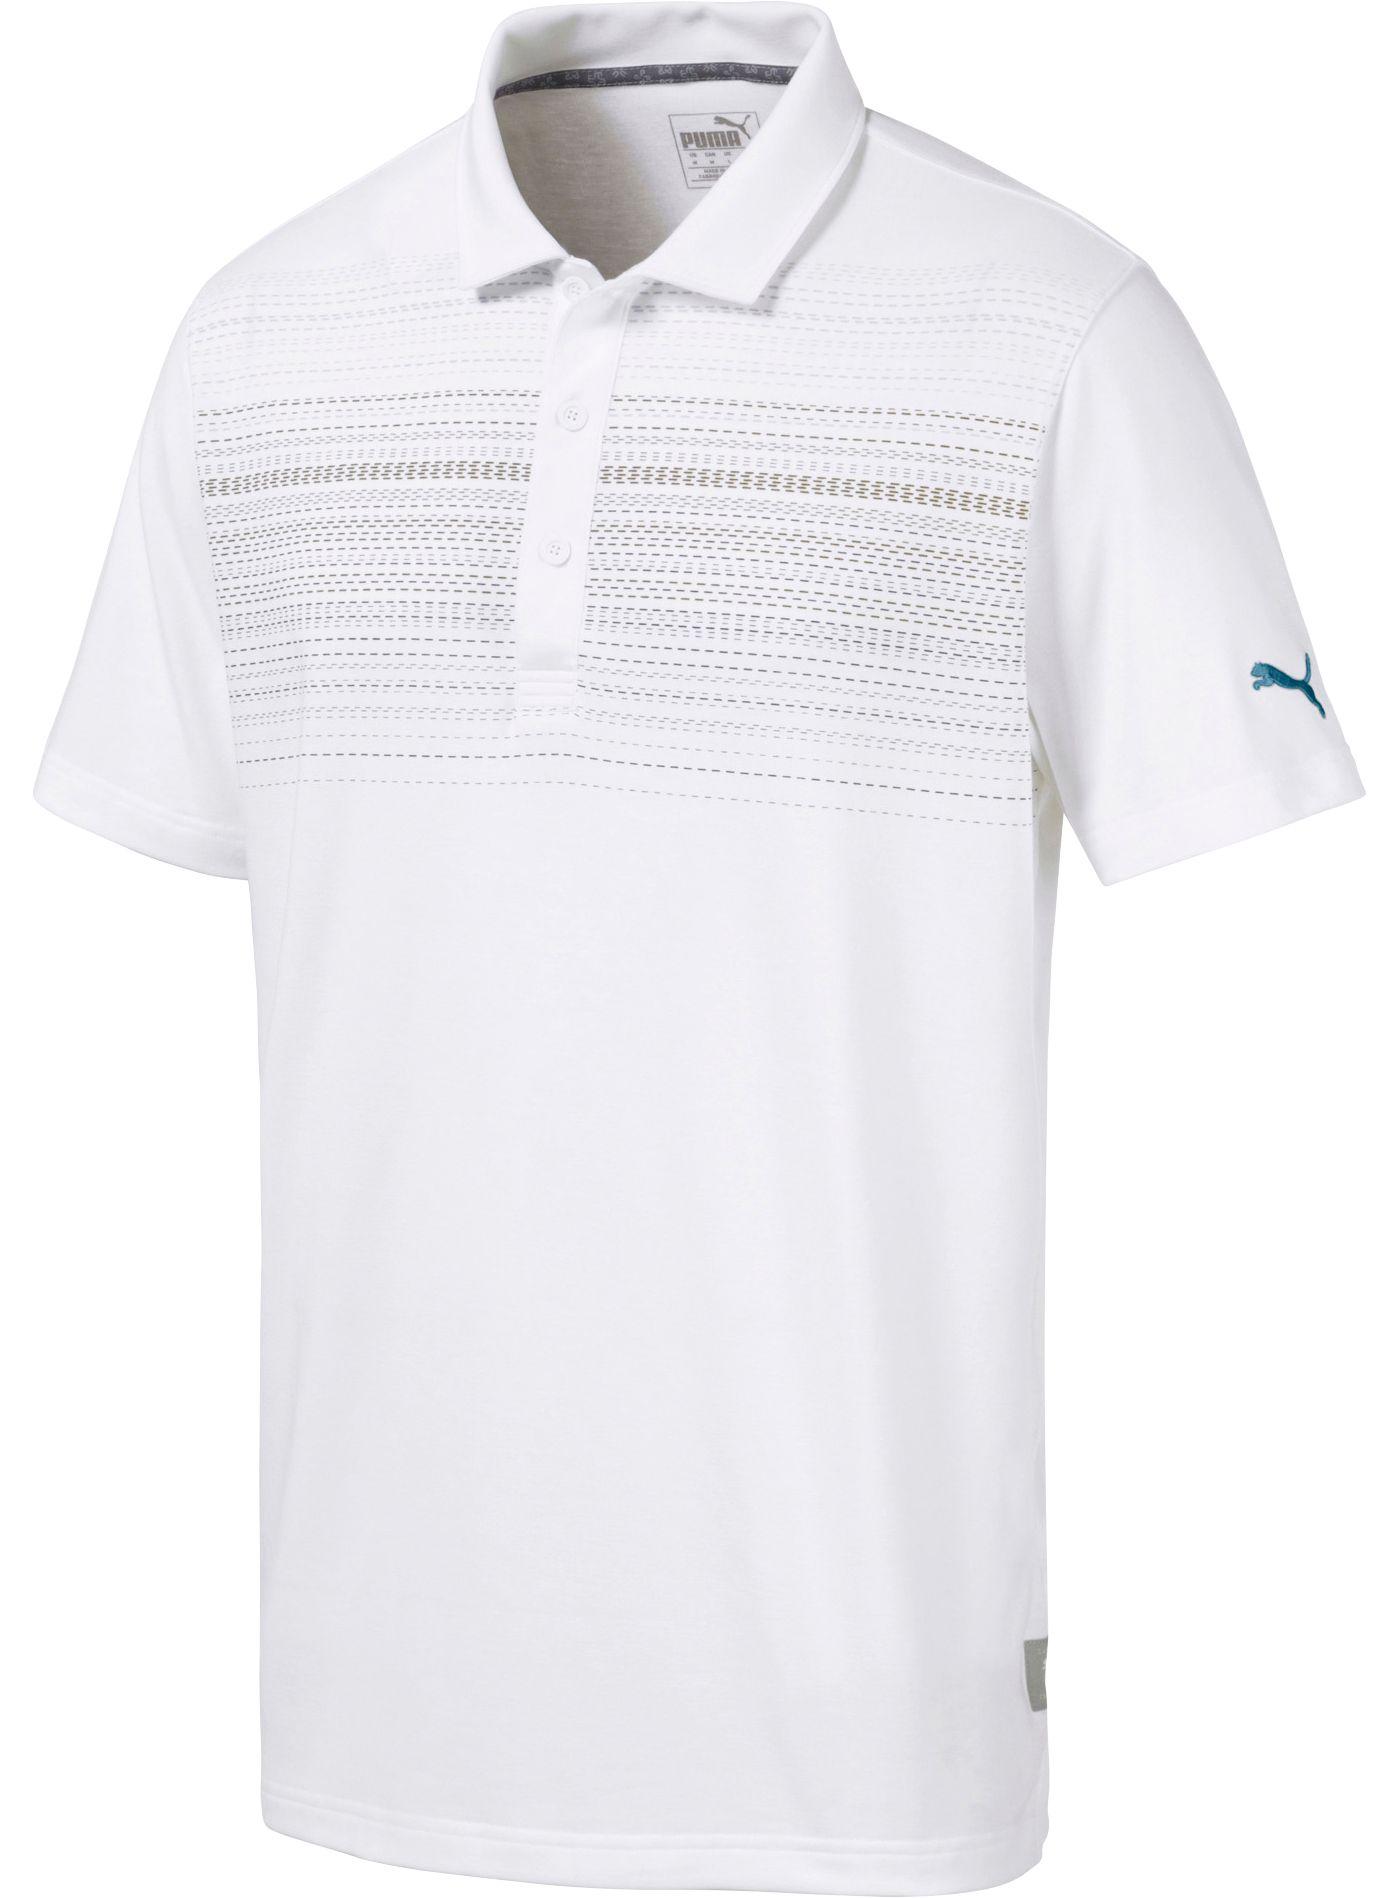 PUMA Men's Limelight Golf Polo